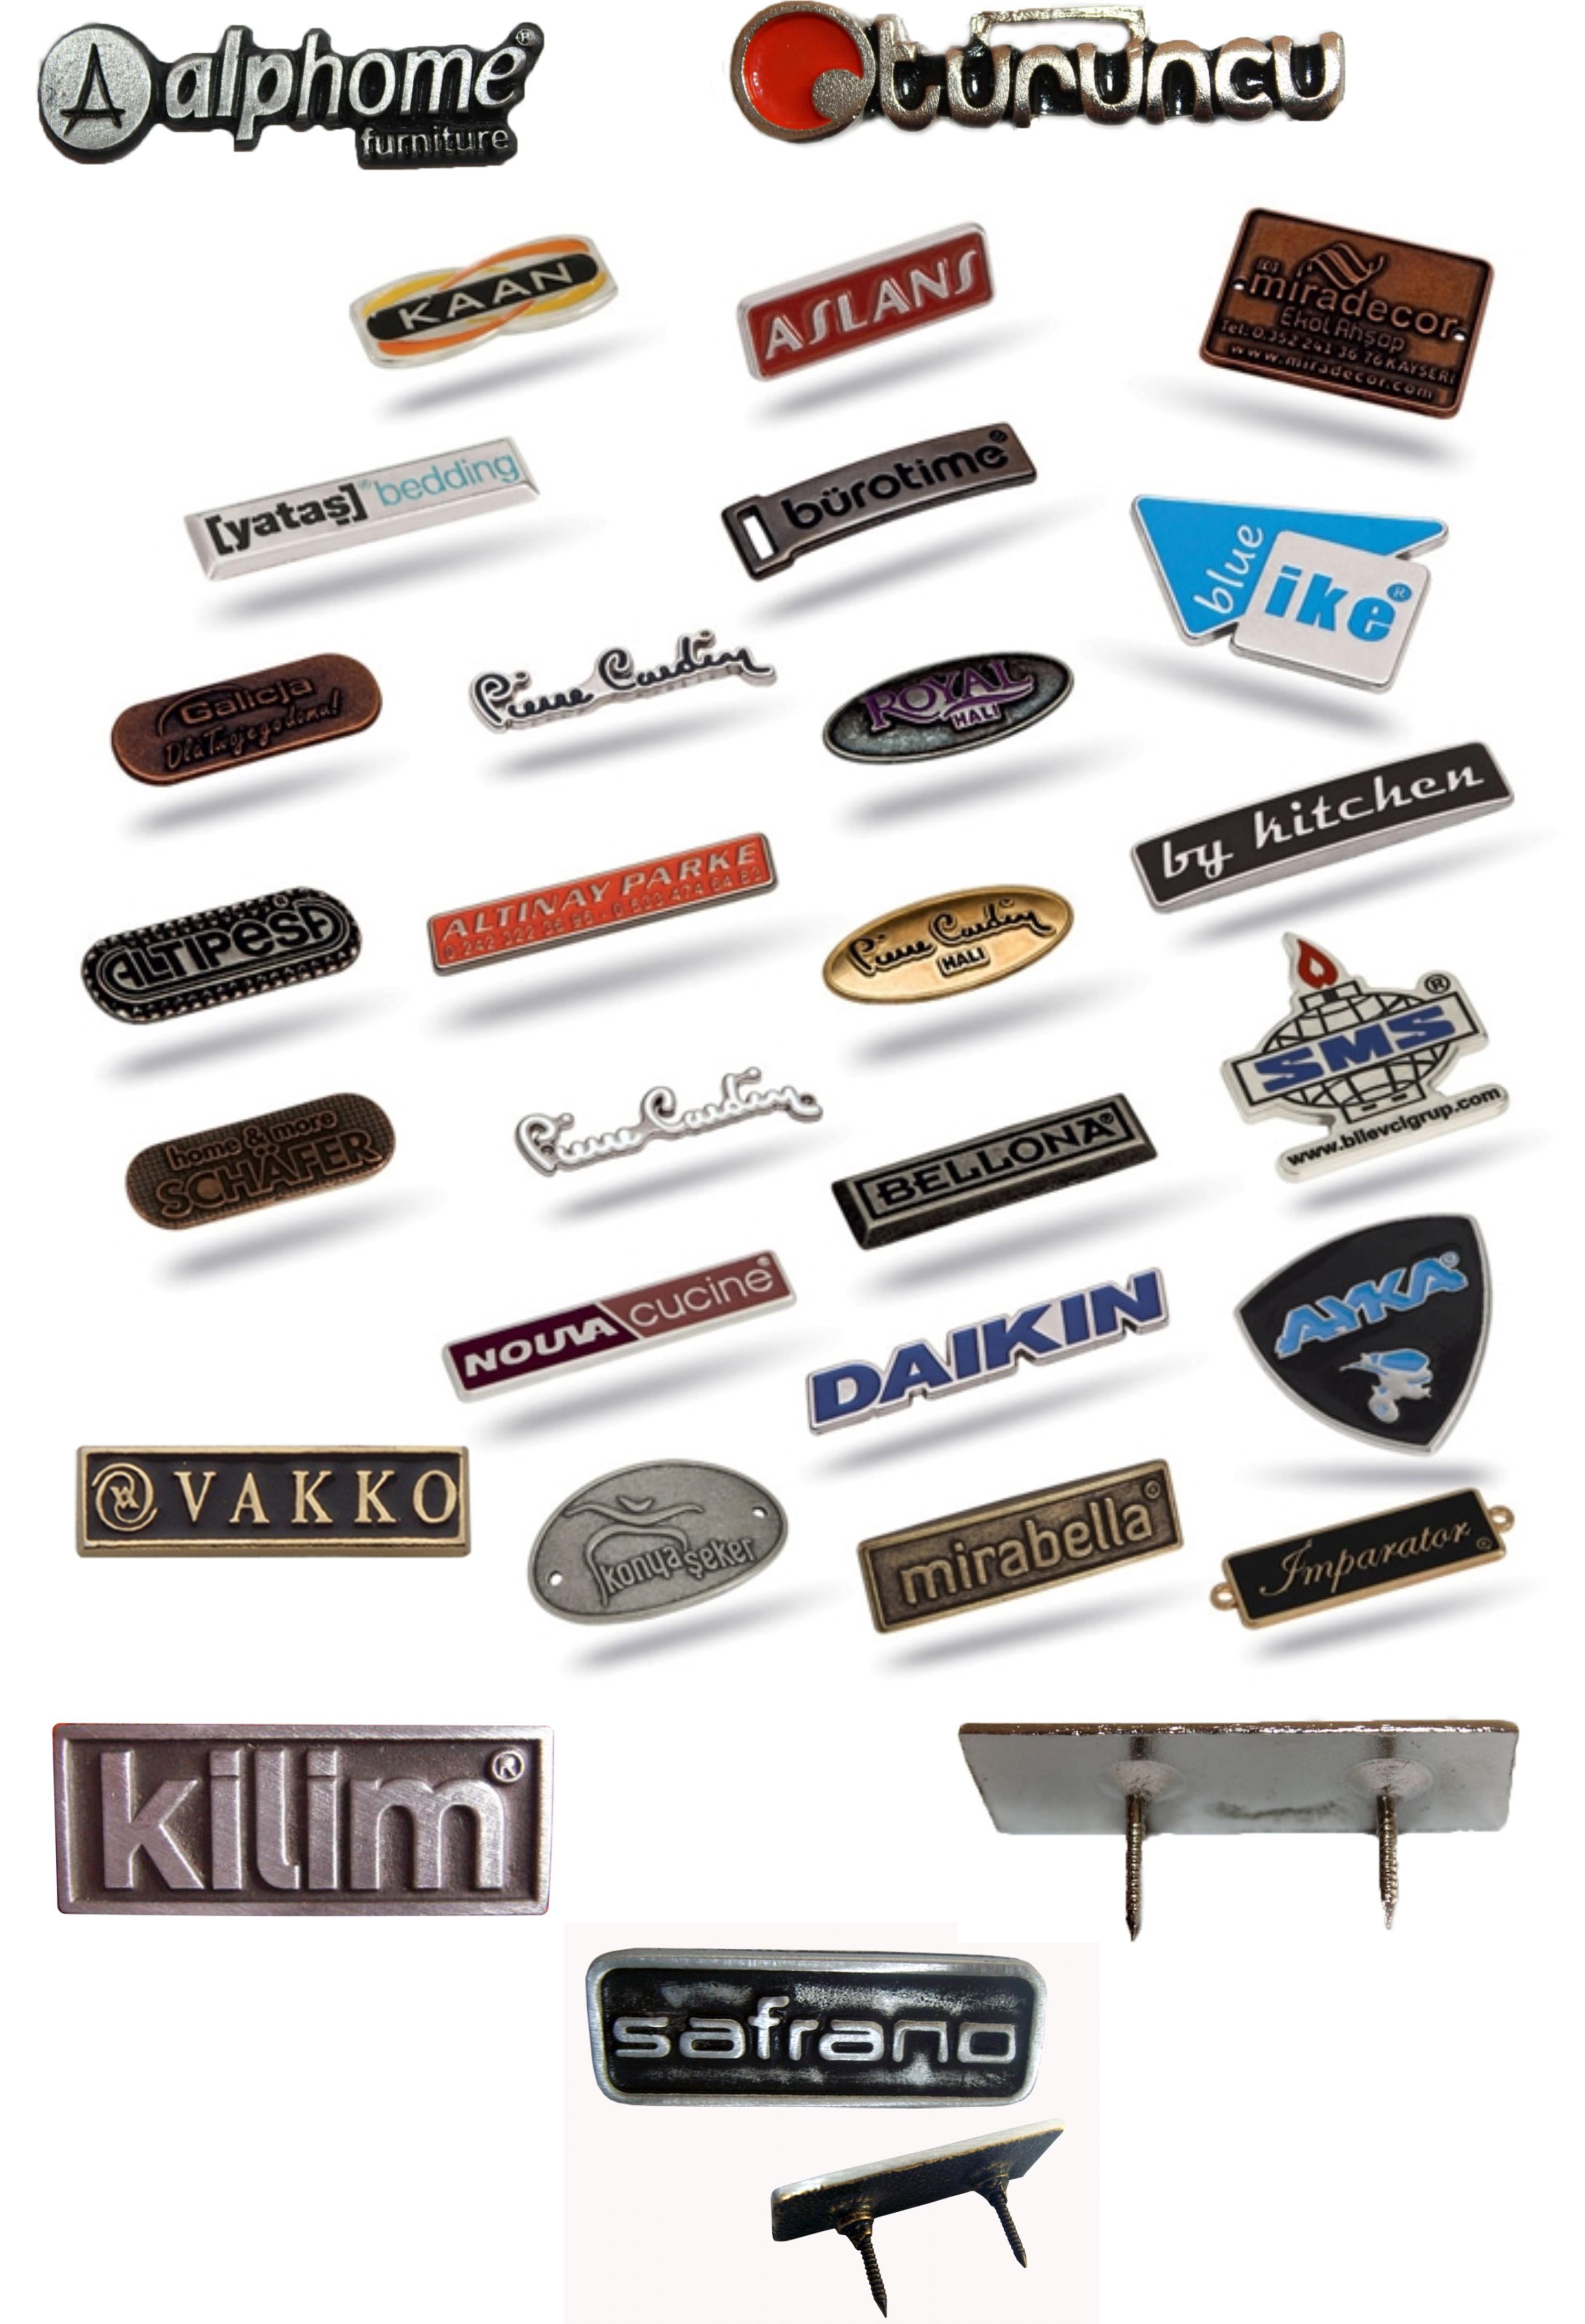 zamak etiket,metal kabartma etiket,çivili etiket,çivili mobilya etiketi,antik etiket,ark anahtarlık,ark anahtarlık imalatı,ark etiket,Bakır etiket,beyaz eşya etiketi,çakma etiket,çelik kapı etiketi,damla etiket,döküm etiket,döküm etiket imalatçıları,eskitme etiket,etiket,gümüş etiket,kalay etiket,konya anahtarlık,konya anahtarlık imalatı,konya etiket imlatçıları,konya metal etiket imlatçıları,konya mobilya etiketi,konya nahtarlık,medikal makine etiketleri,metal,metal etiket imlatçıları,mobilya etiketi,otomotiv etiketi,Pirinç etiket,promosyon,promosyon anahtarlık,promosyon anahtarlık konya,raf etiketi,silikon etiket,üç boyutlu etiket,vidali etiket,yapıştırma etiket,zamak döküm,zamak etiket